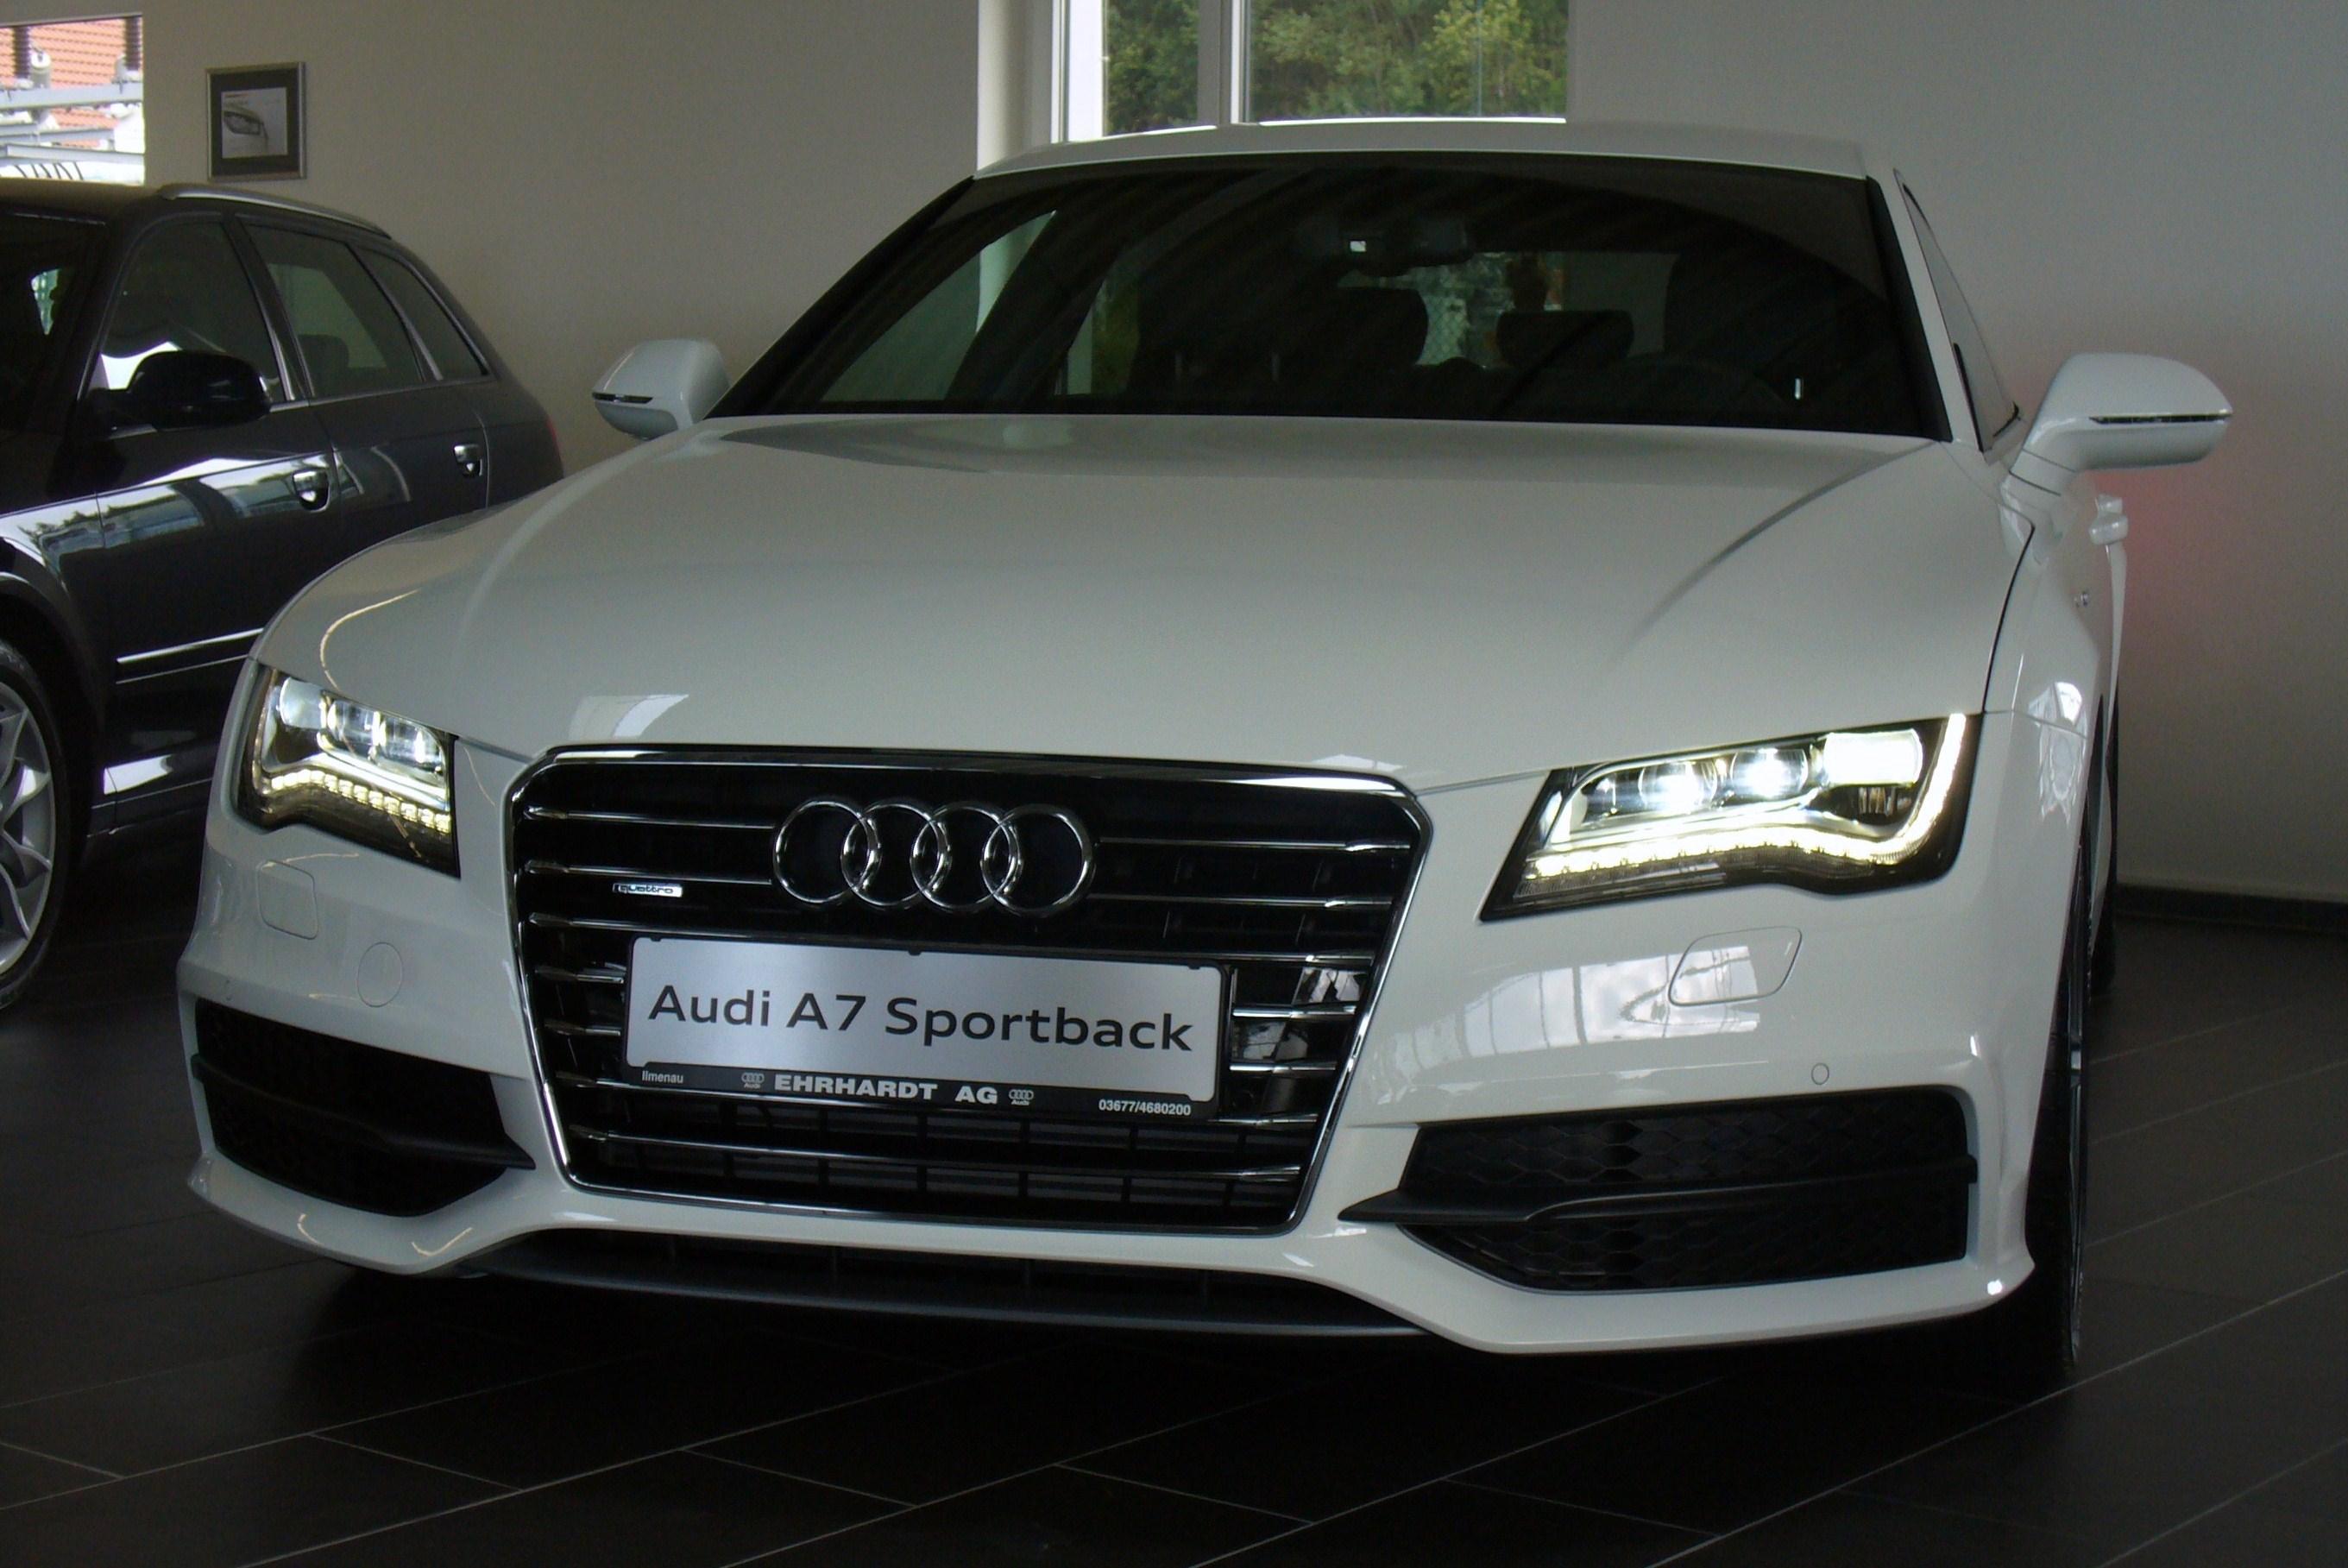 File:Audi A7 Sportback 3.0 TDI quattro S tronic Ibisweiß